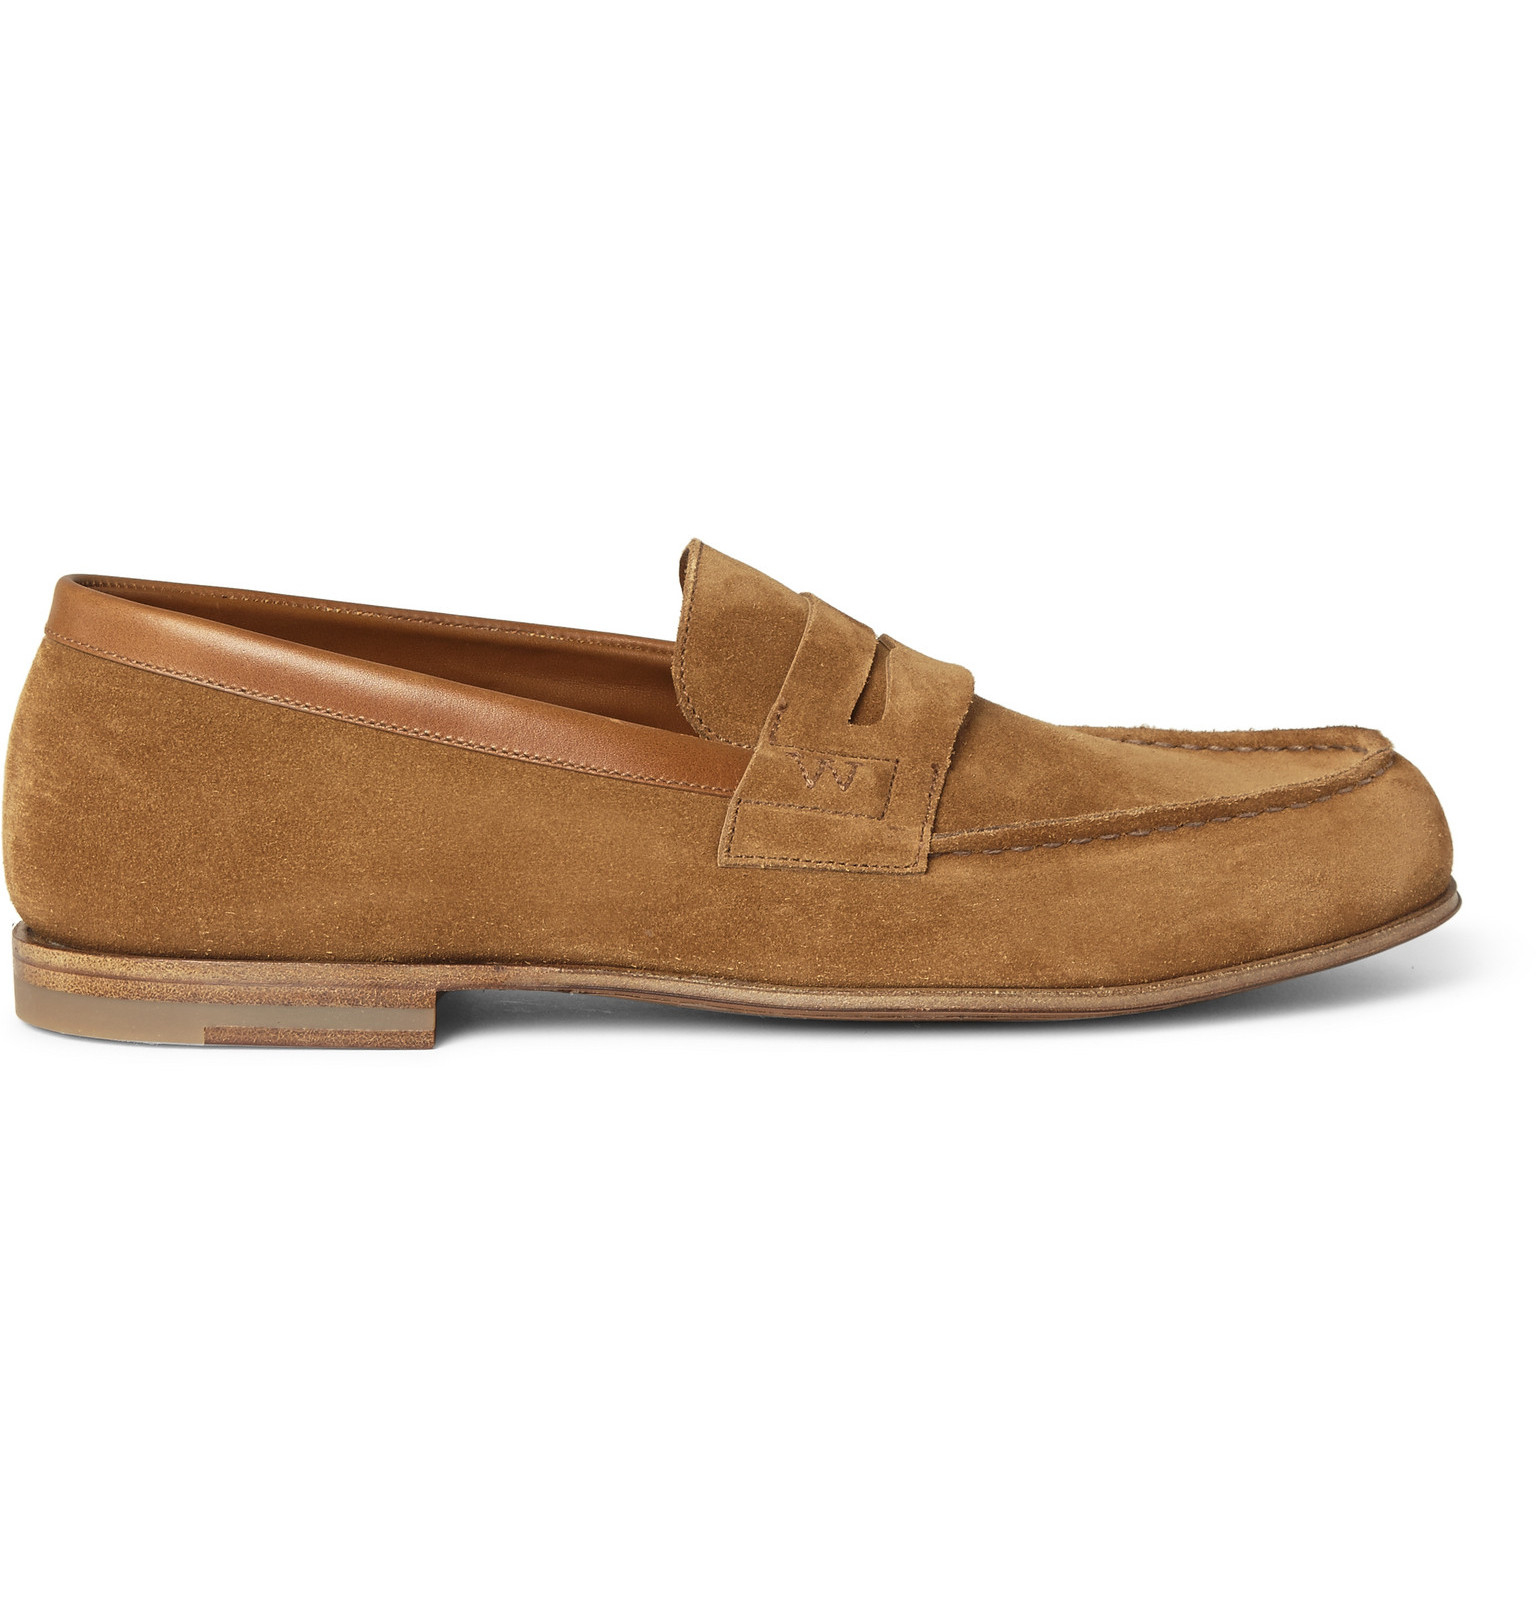 281 Le Moc Suede Loafers J.M. Weston Rw5VTfqBZ7